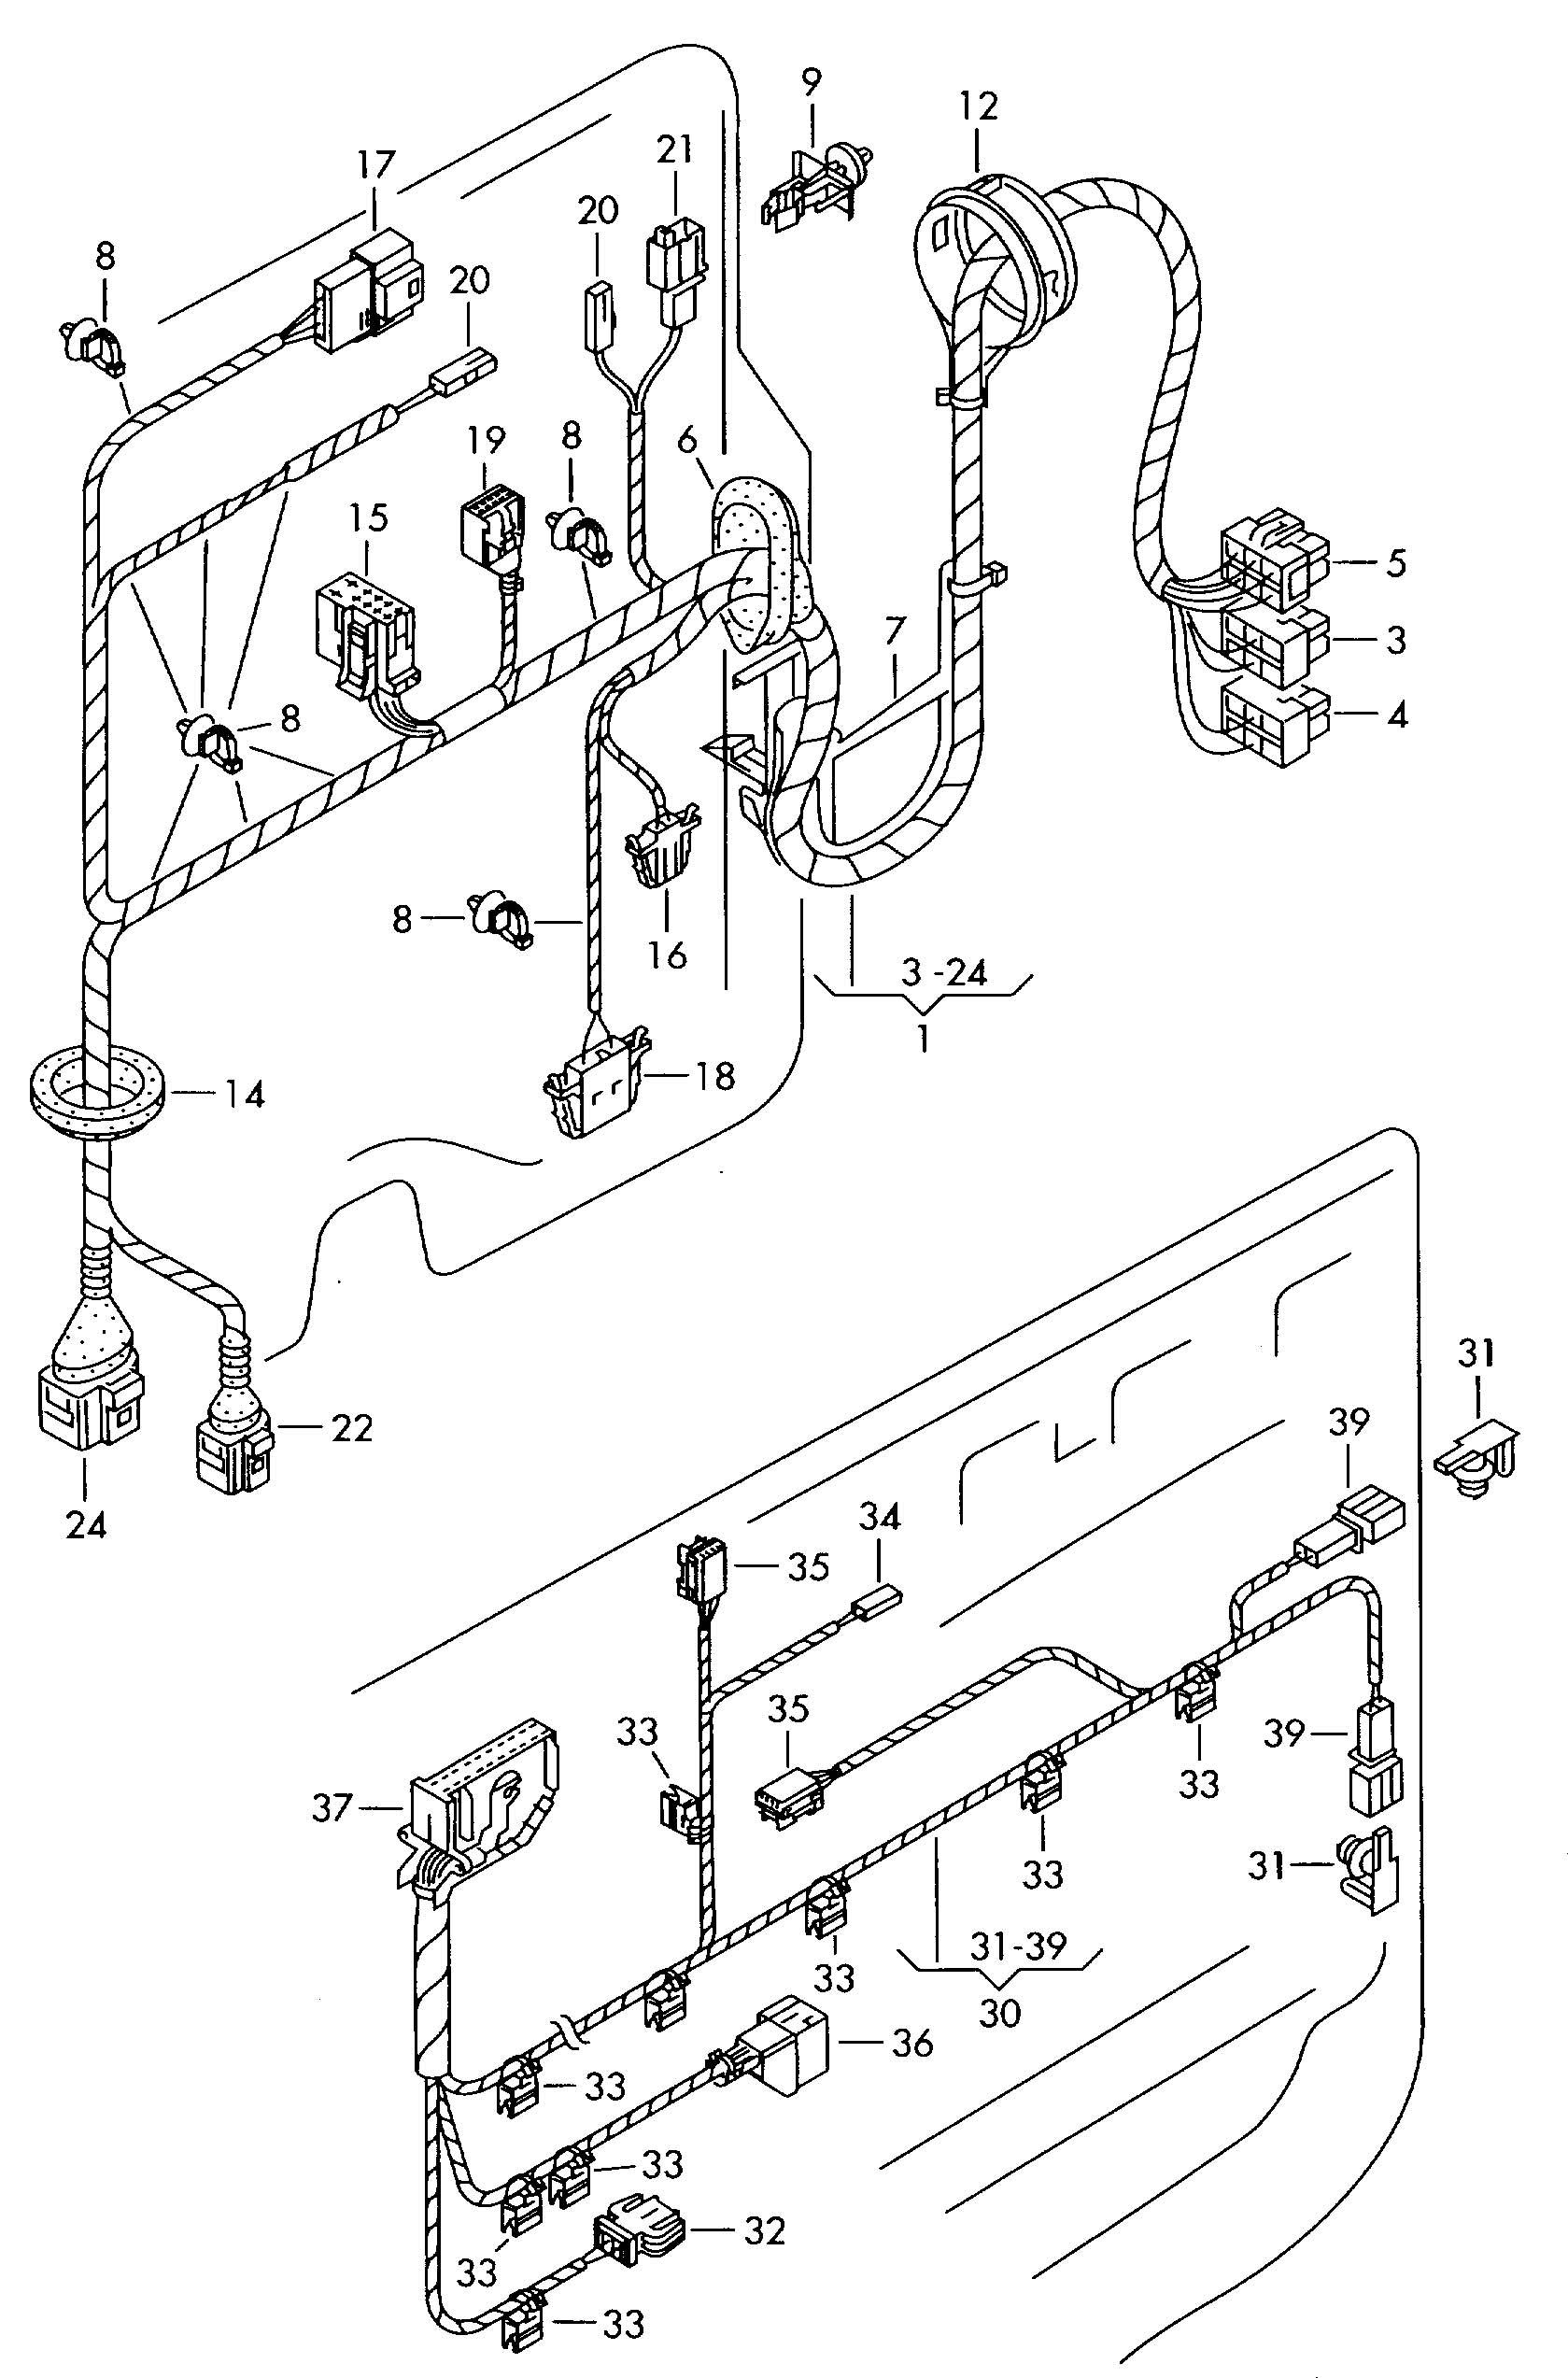 Battery Harness Adapter